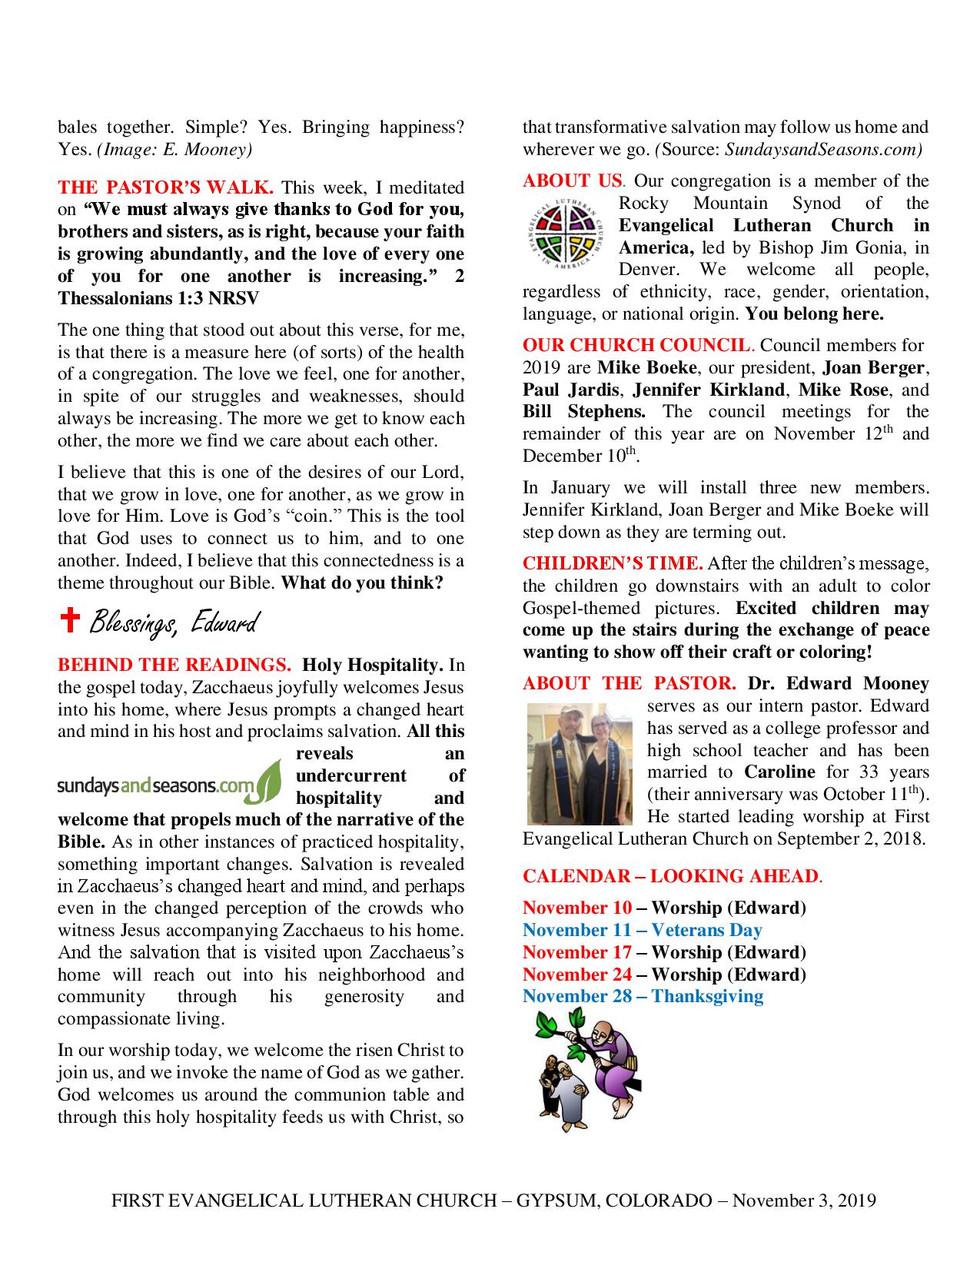 Newsletter - November 3, 2019, Page 2